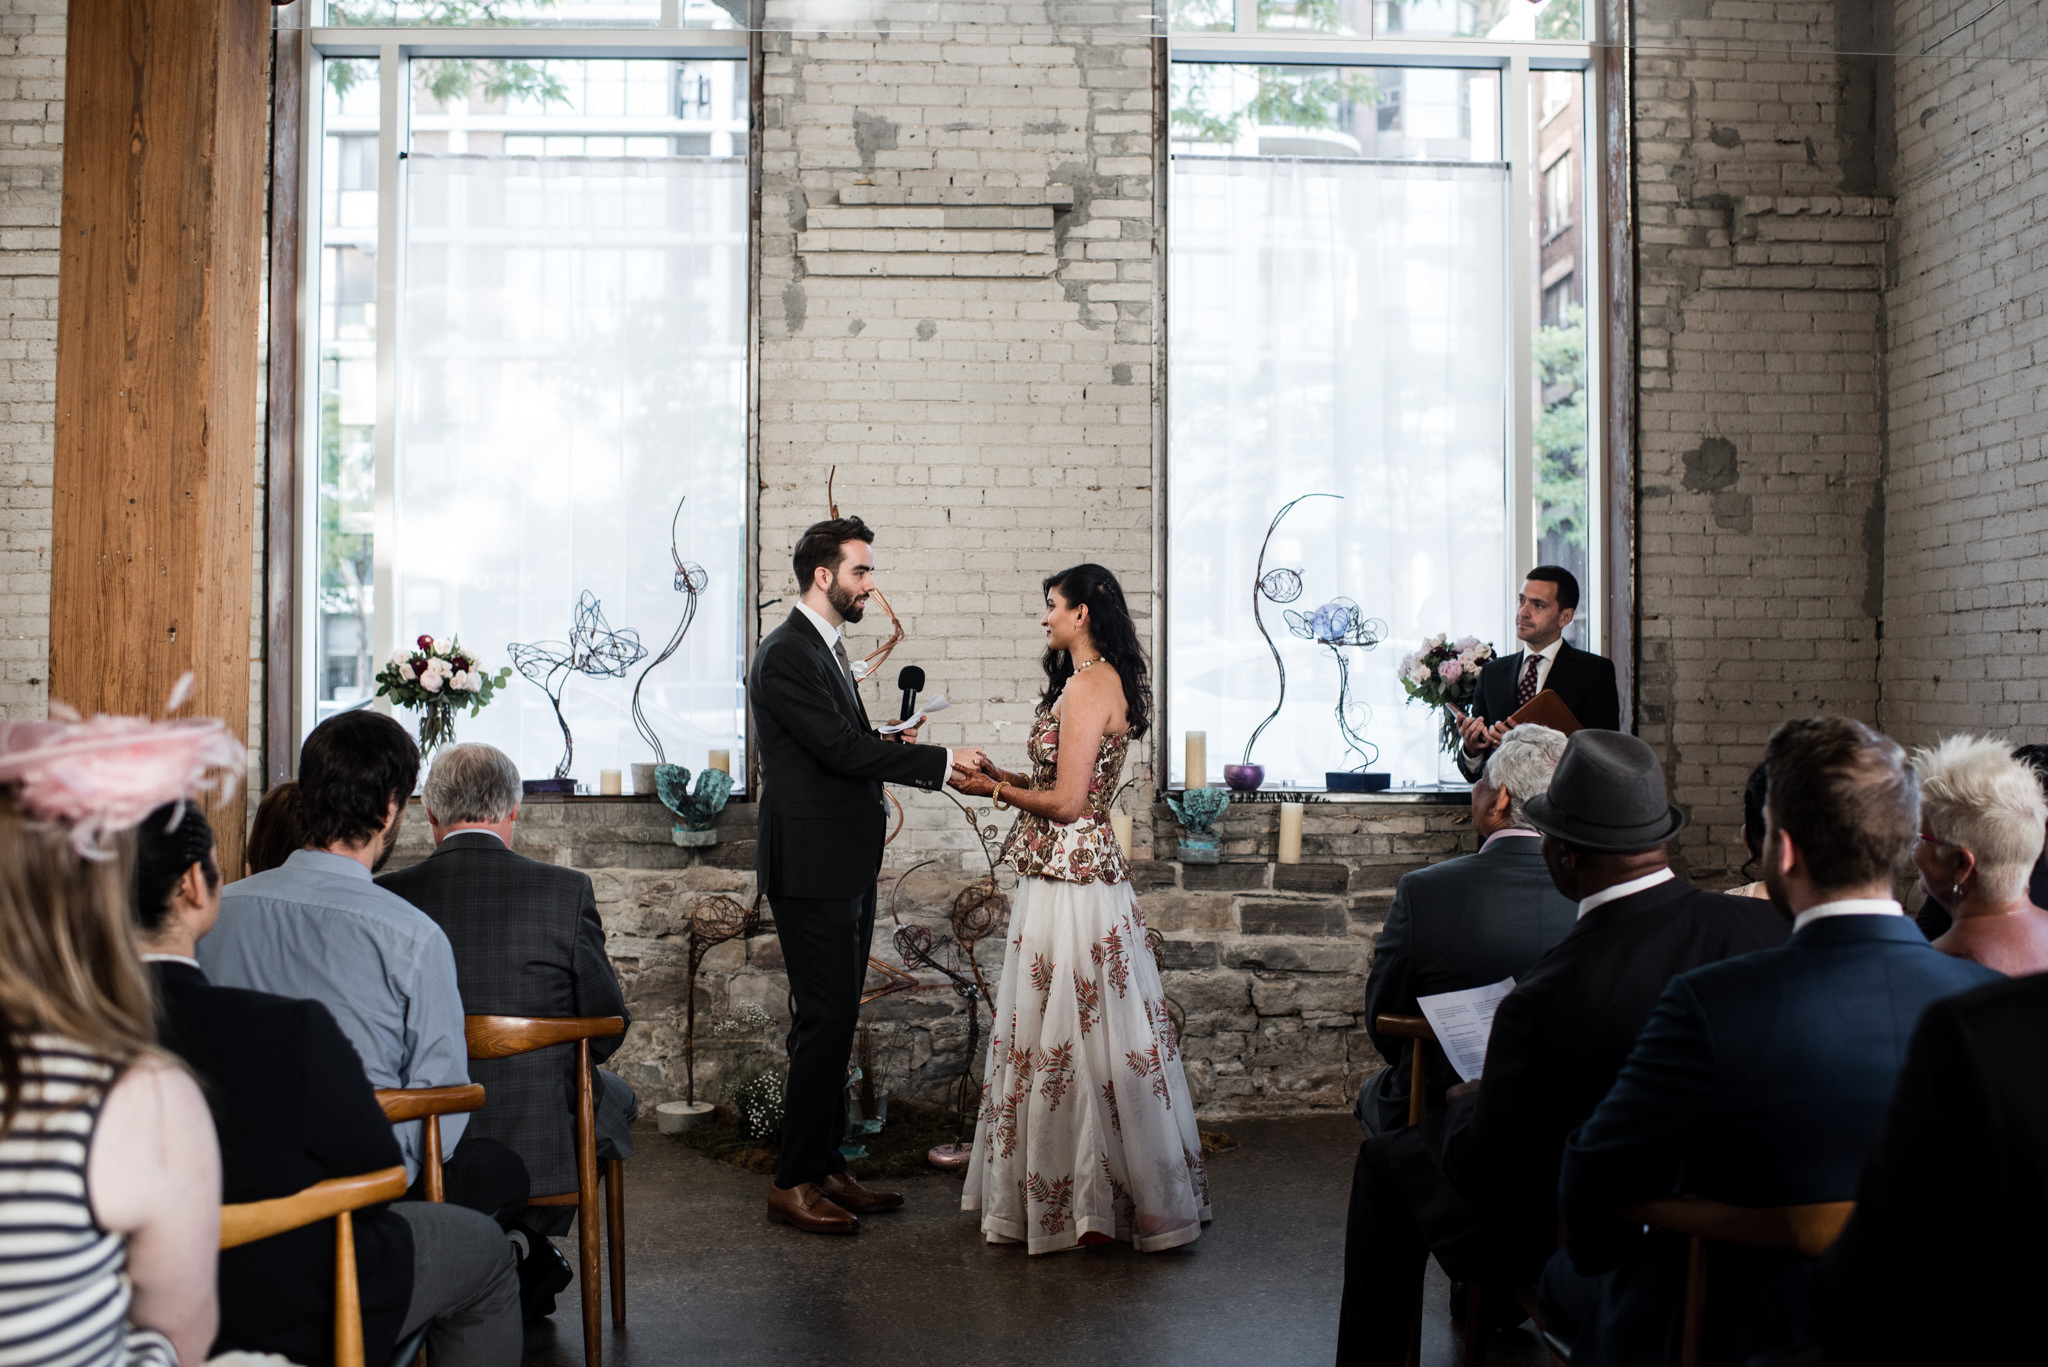 075-wedding-ceremony-hotel-ocho-inspiration-toronto-photographer-intimate.jpg